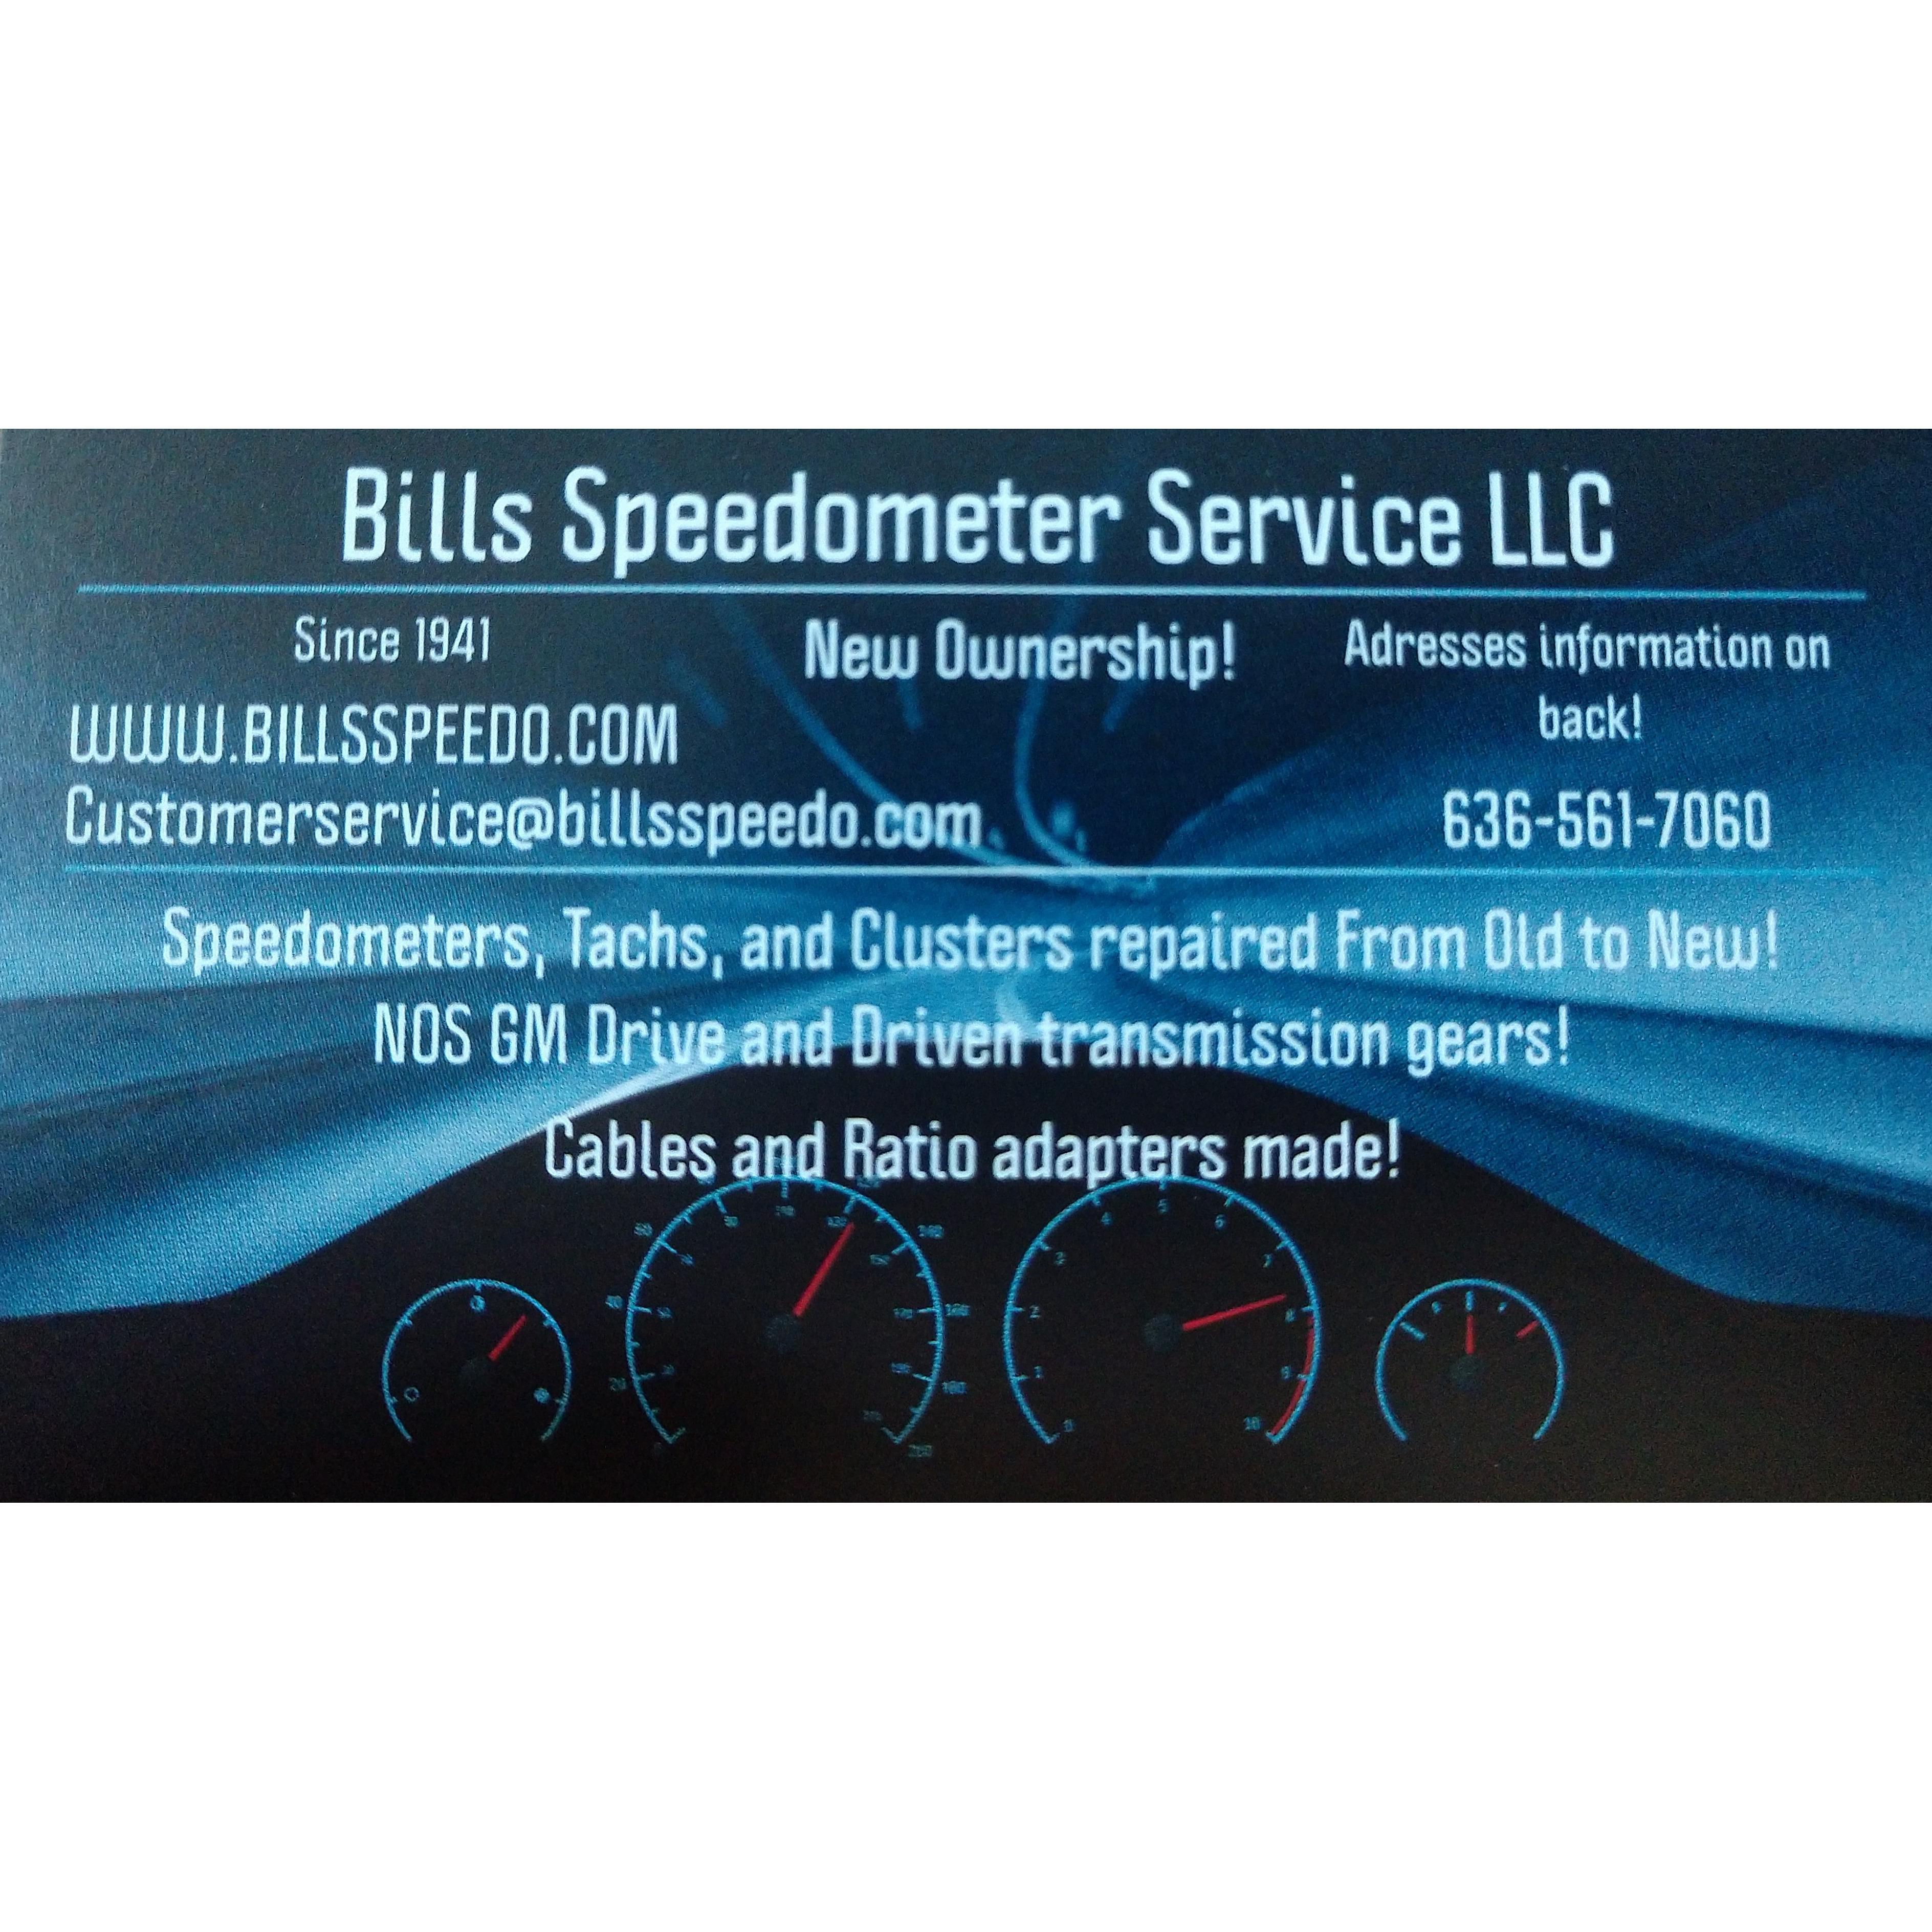 Bills Speedometer service